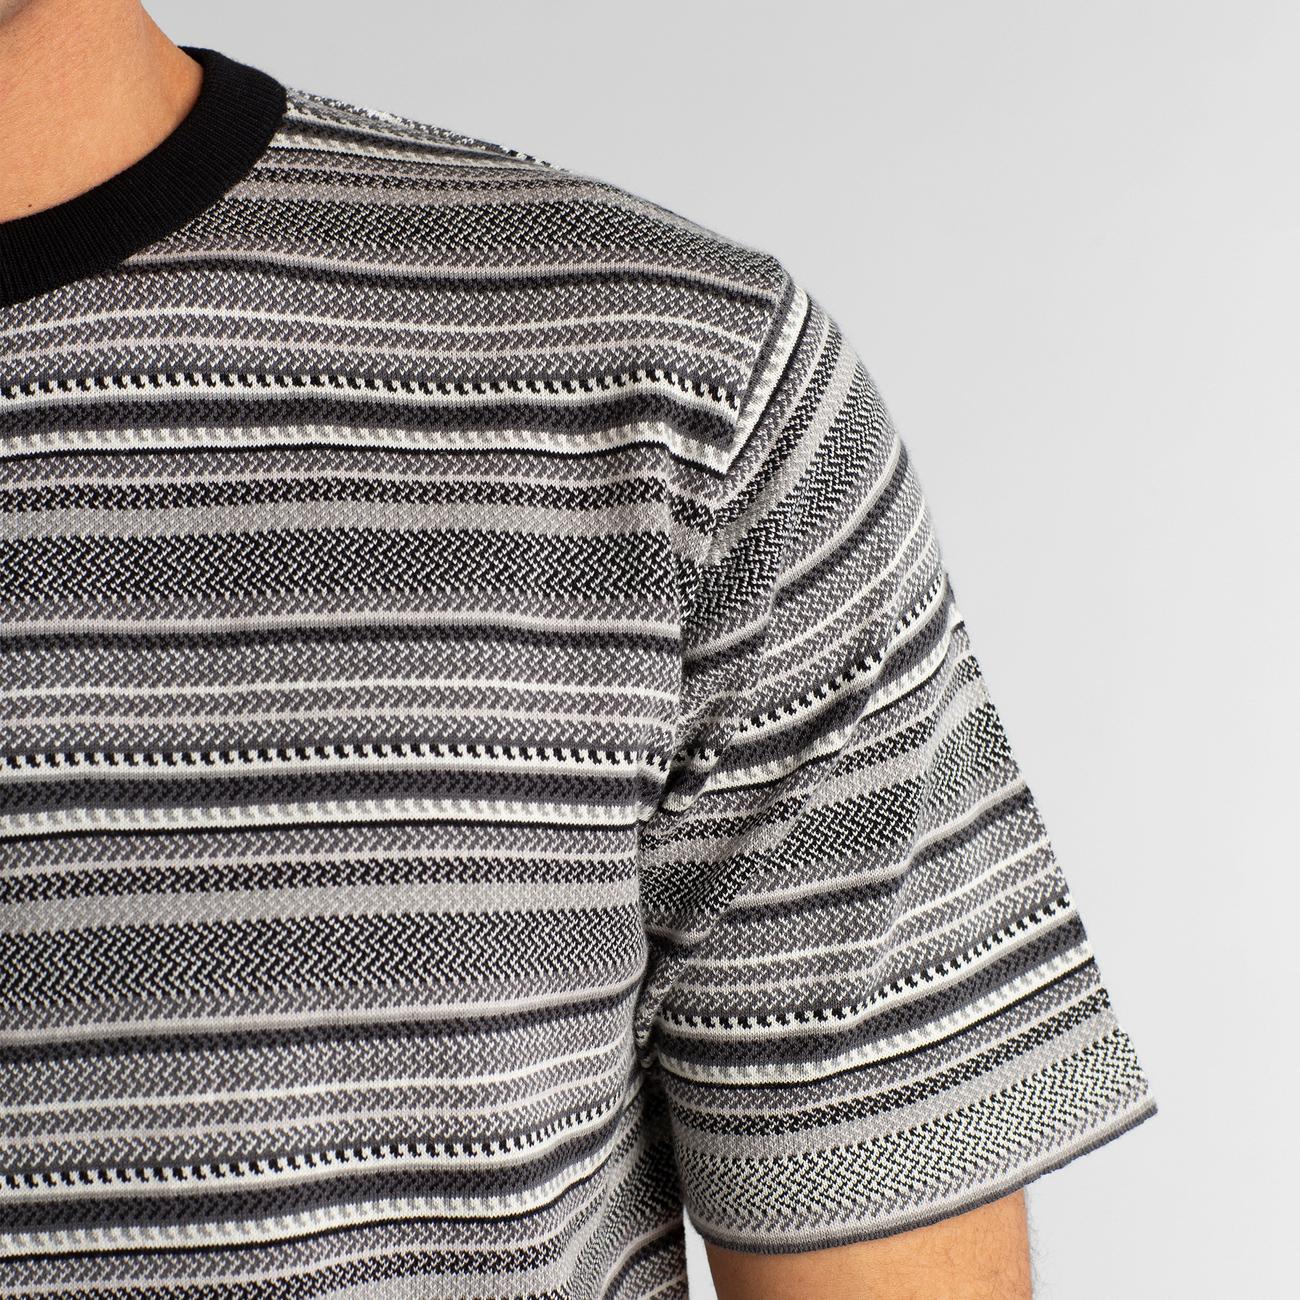 T-shirt Knitted Husum Black